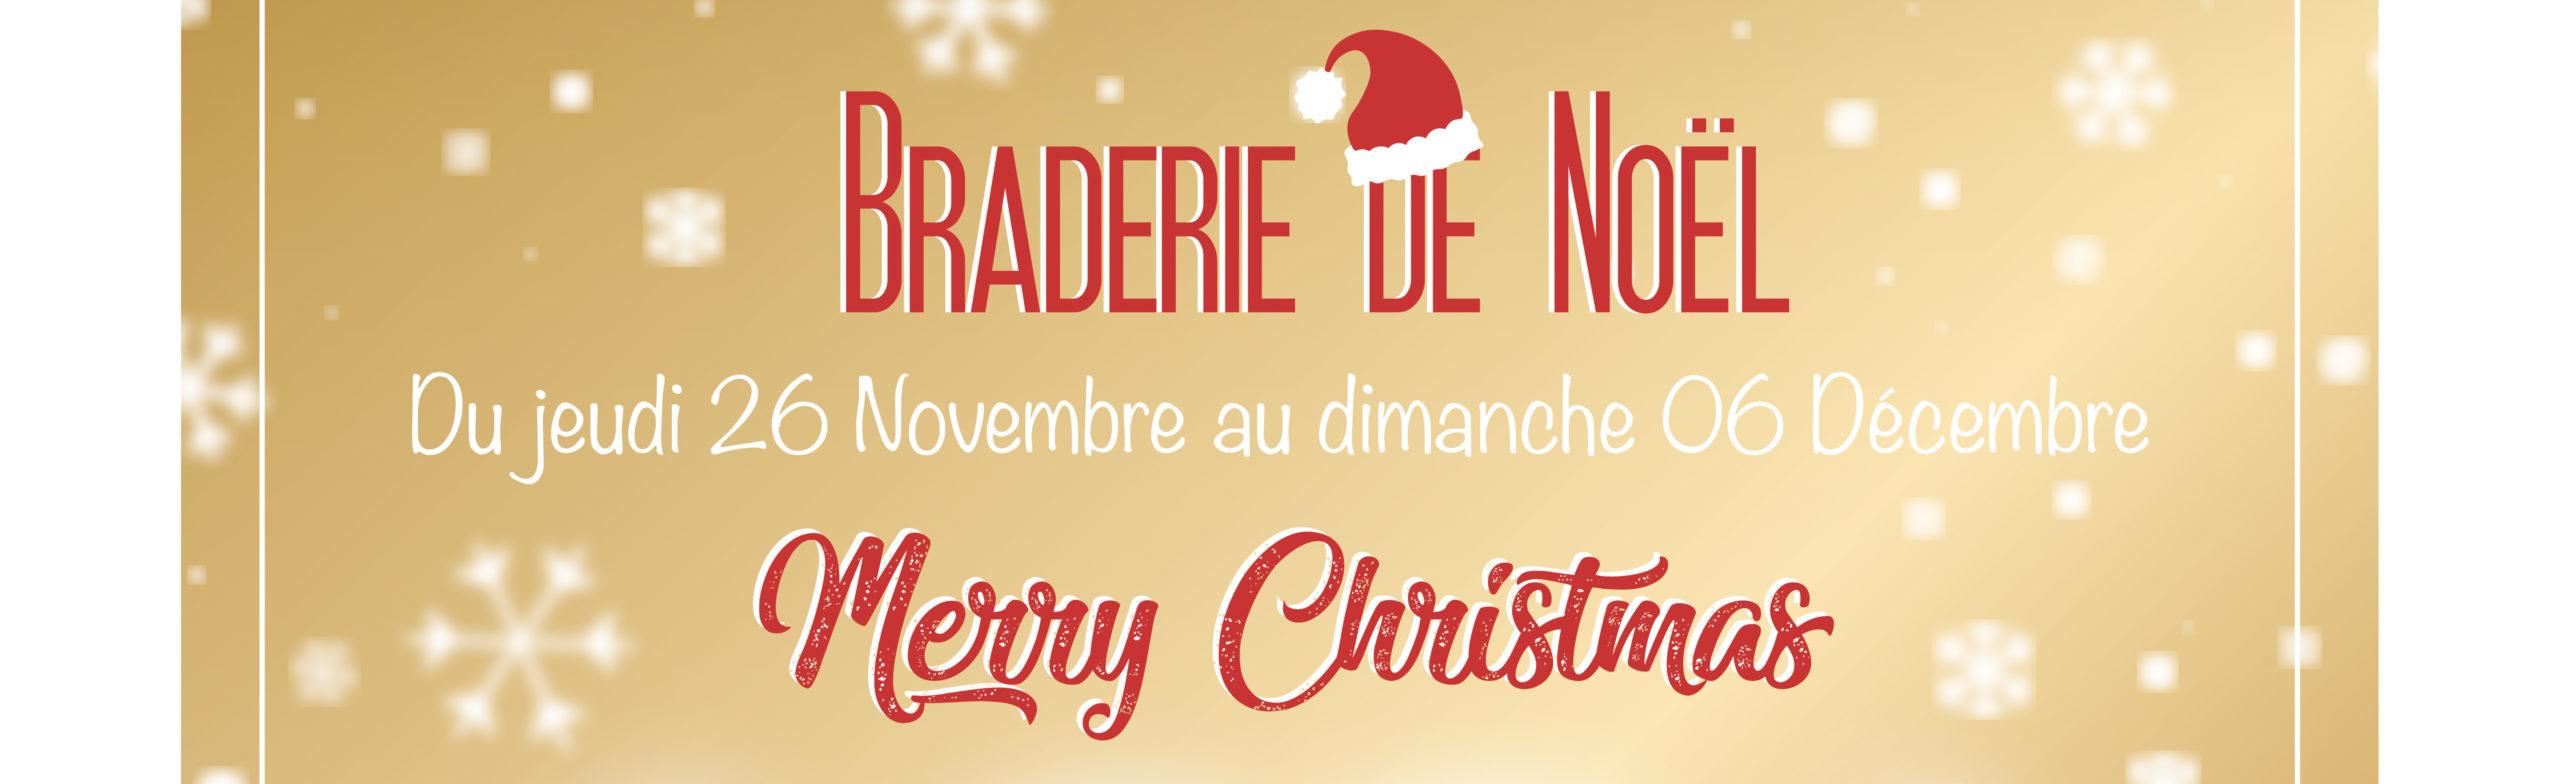 Ban_Noël